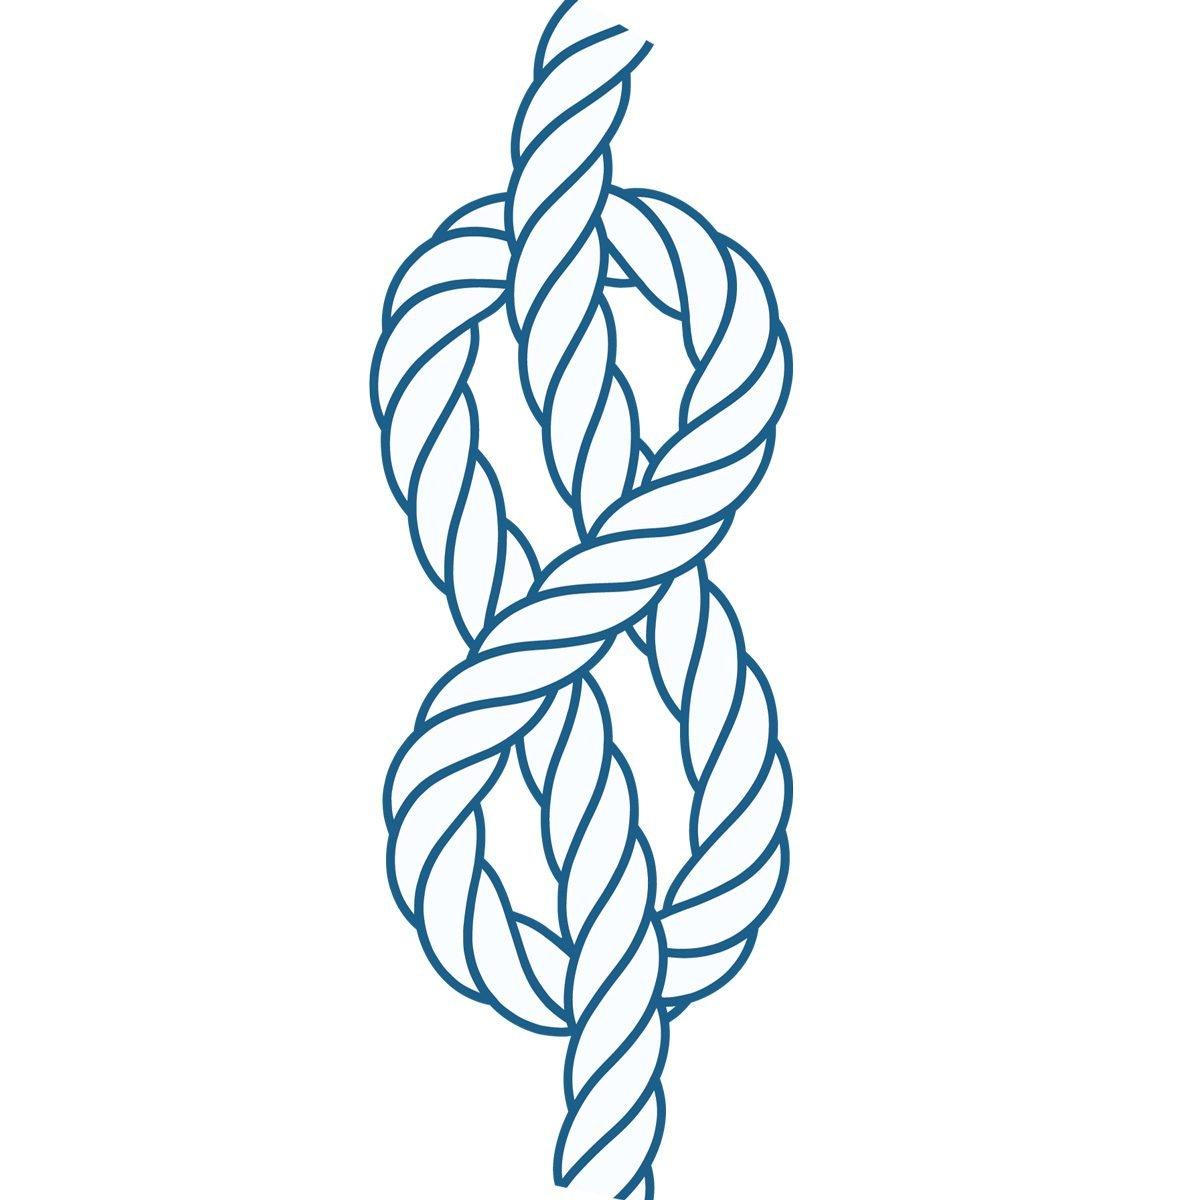 knots-02 figure 8 knot